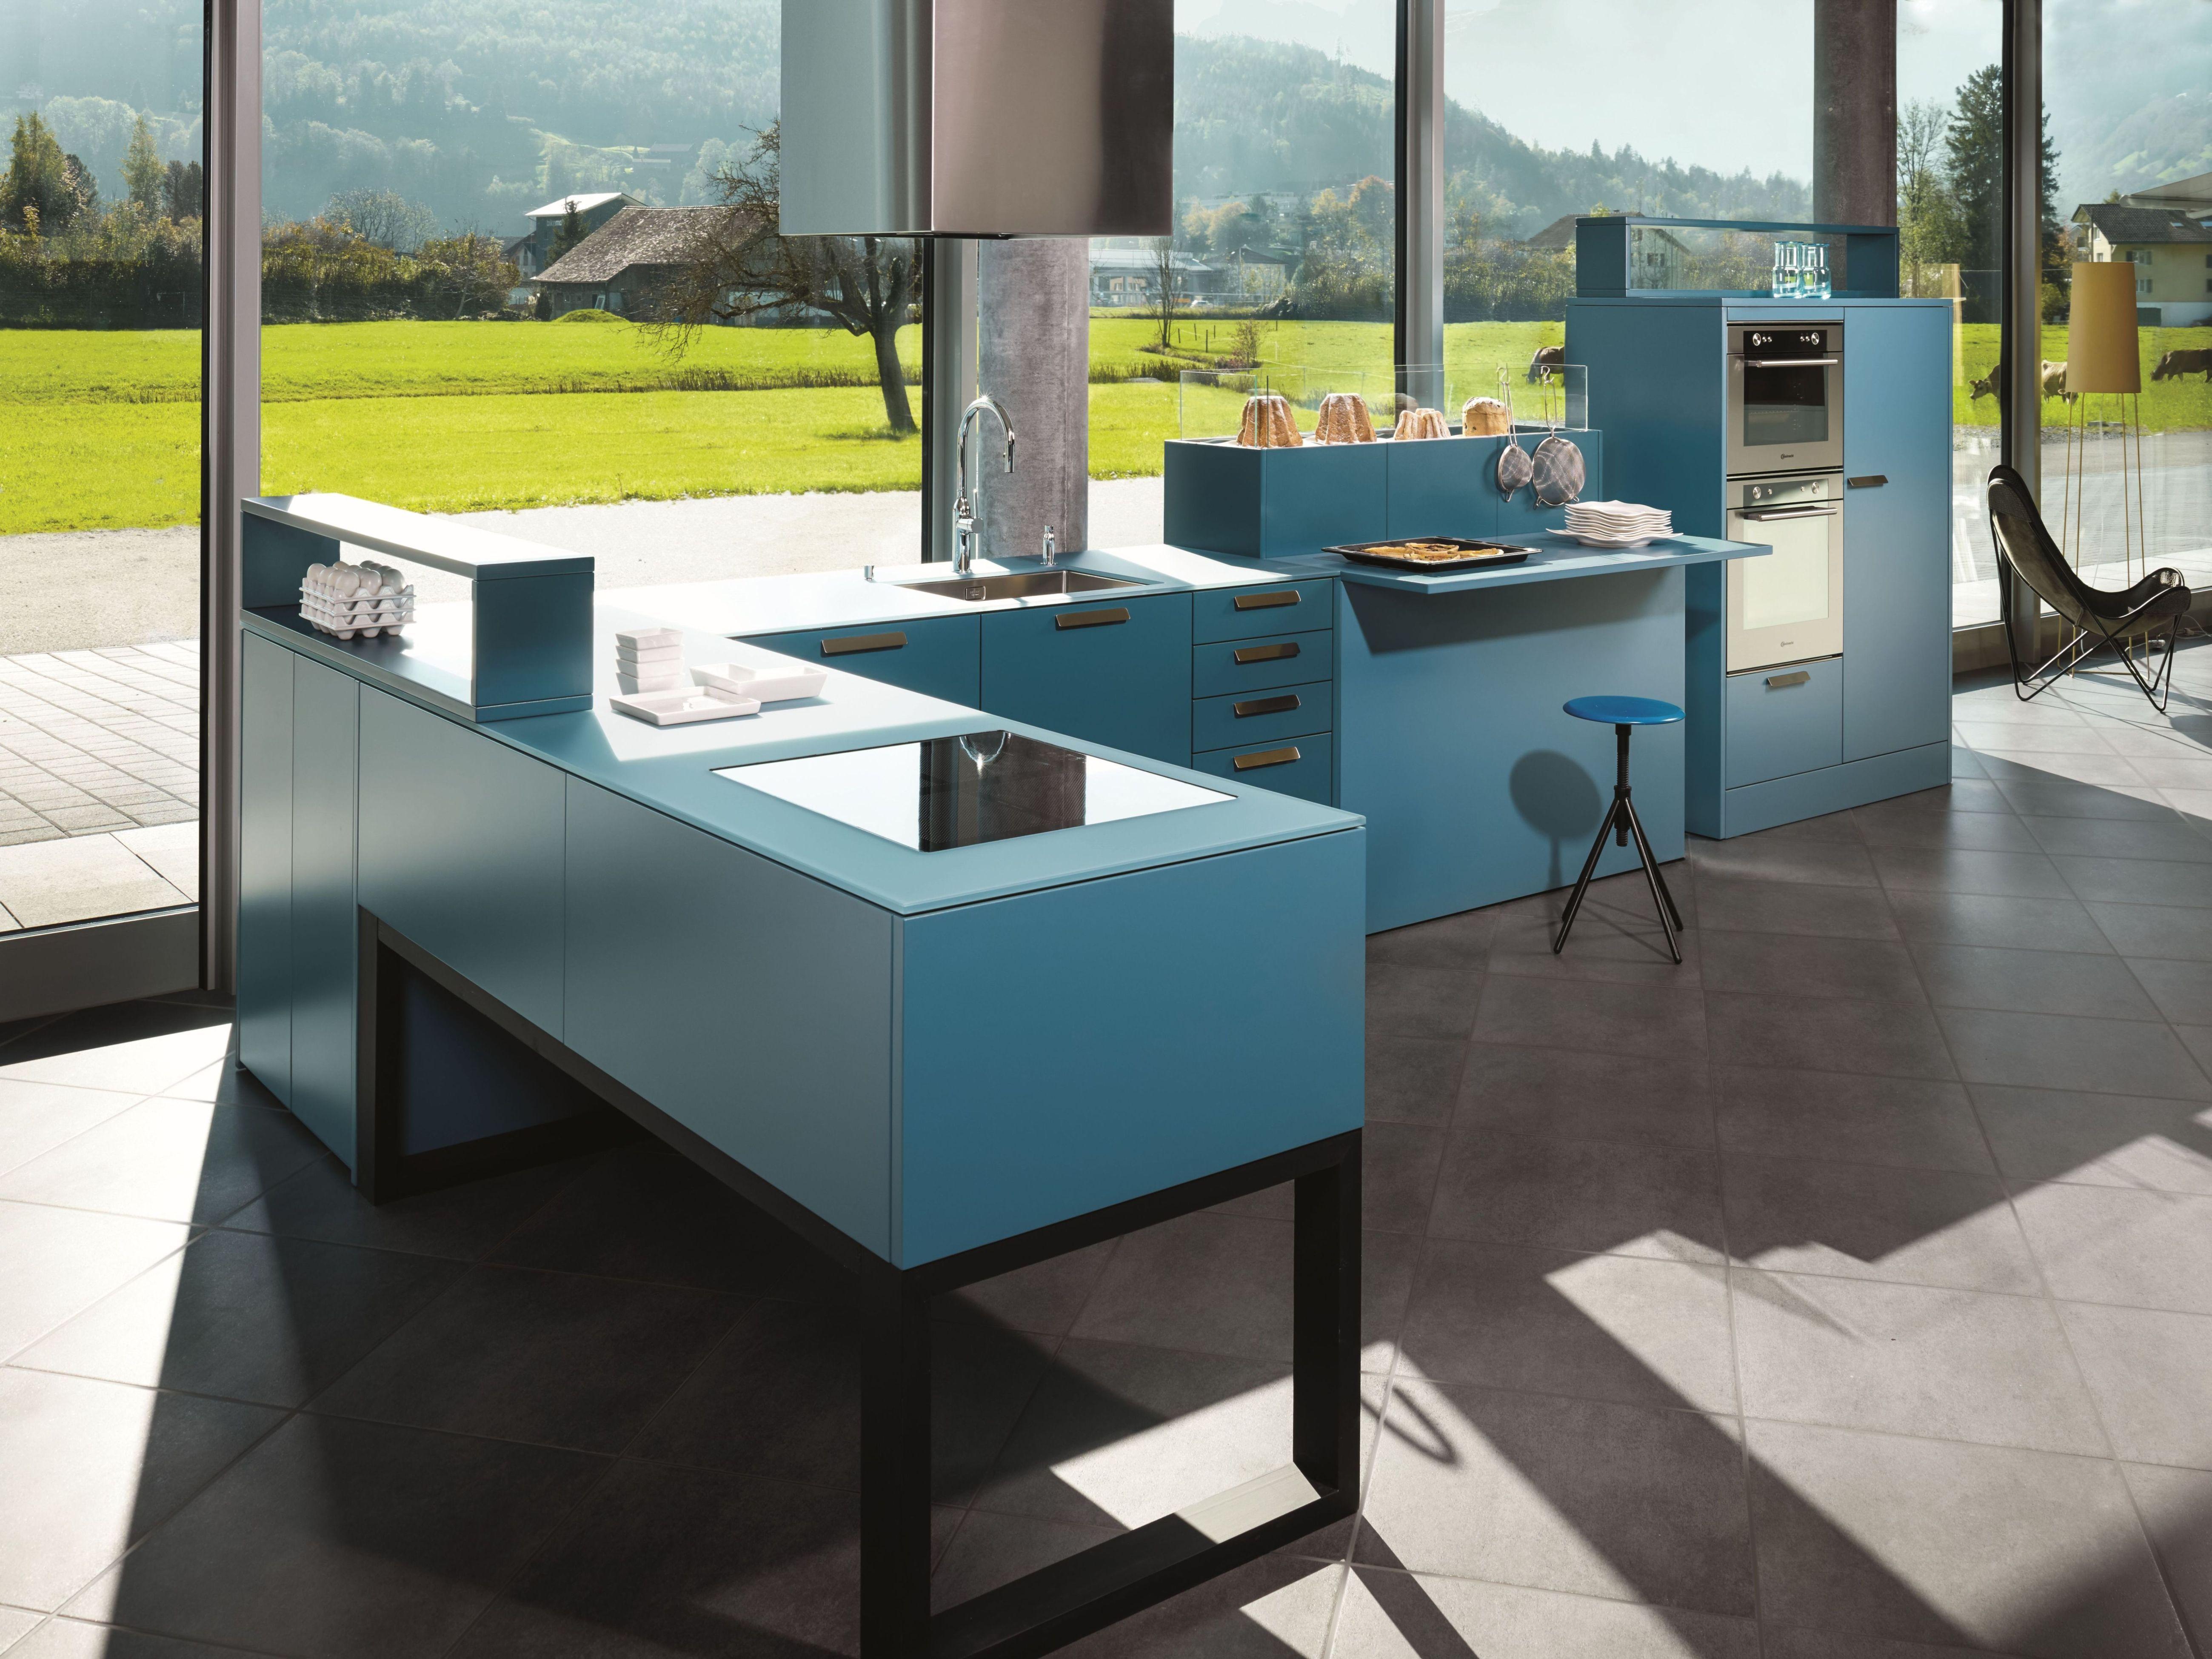 Kh Kuche Pulverlack Blau Kh Kitchen Powdercoated Blue Moderne